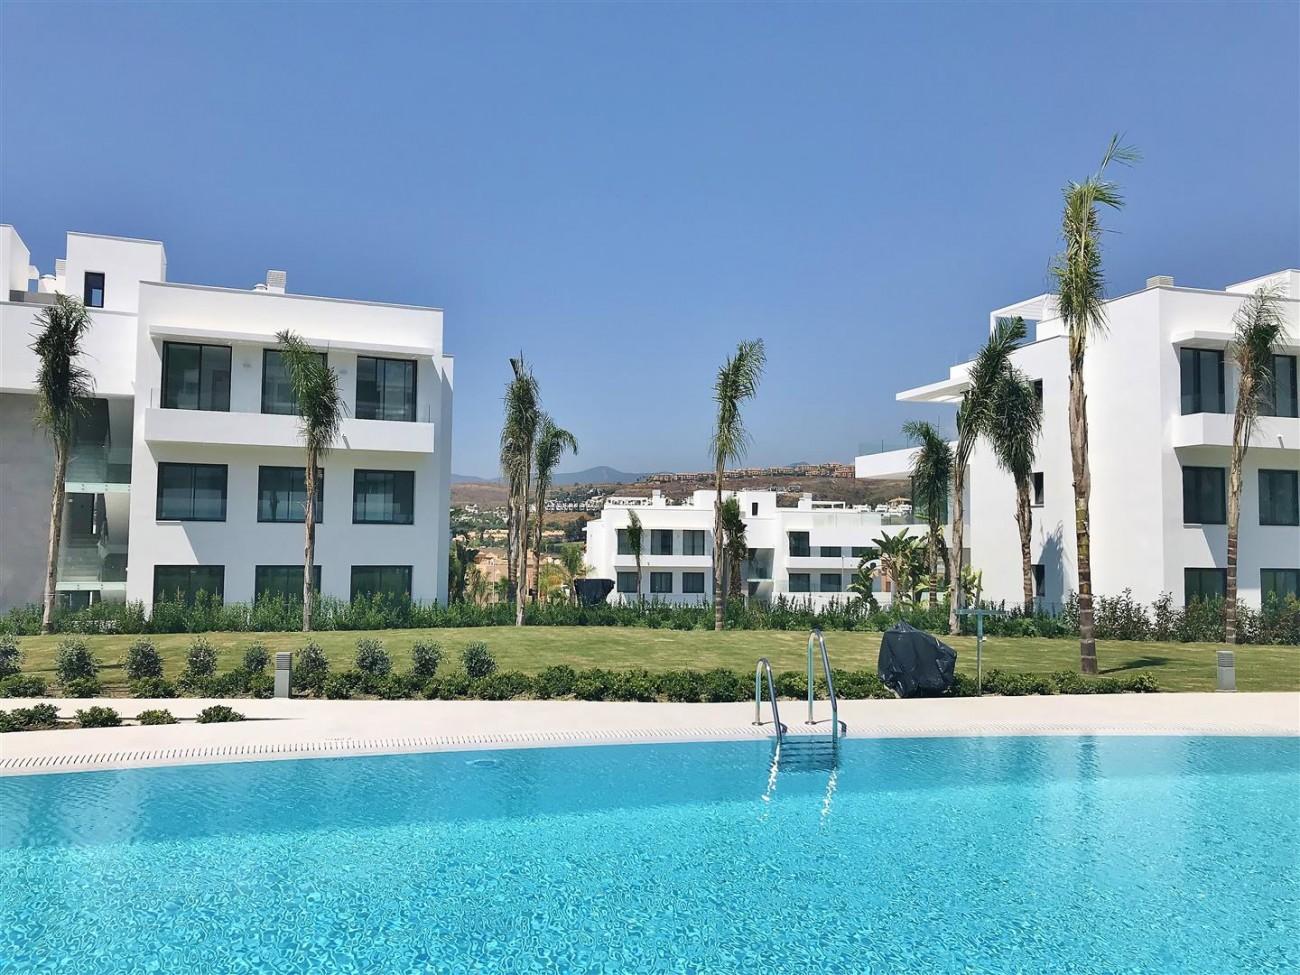 New Contemporary Apartment for sale Estepona Spain (31) (Large)